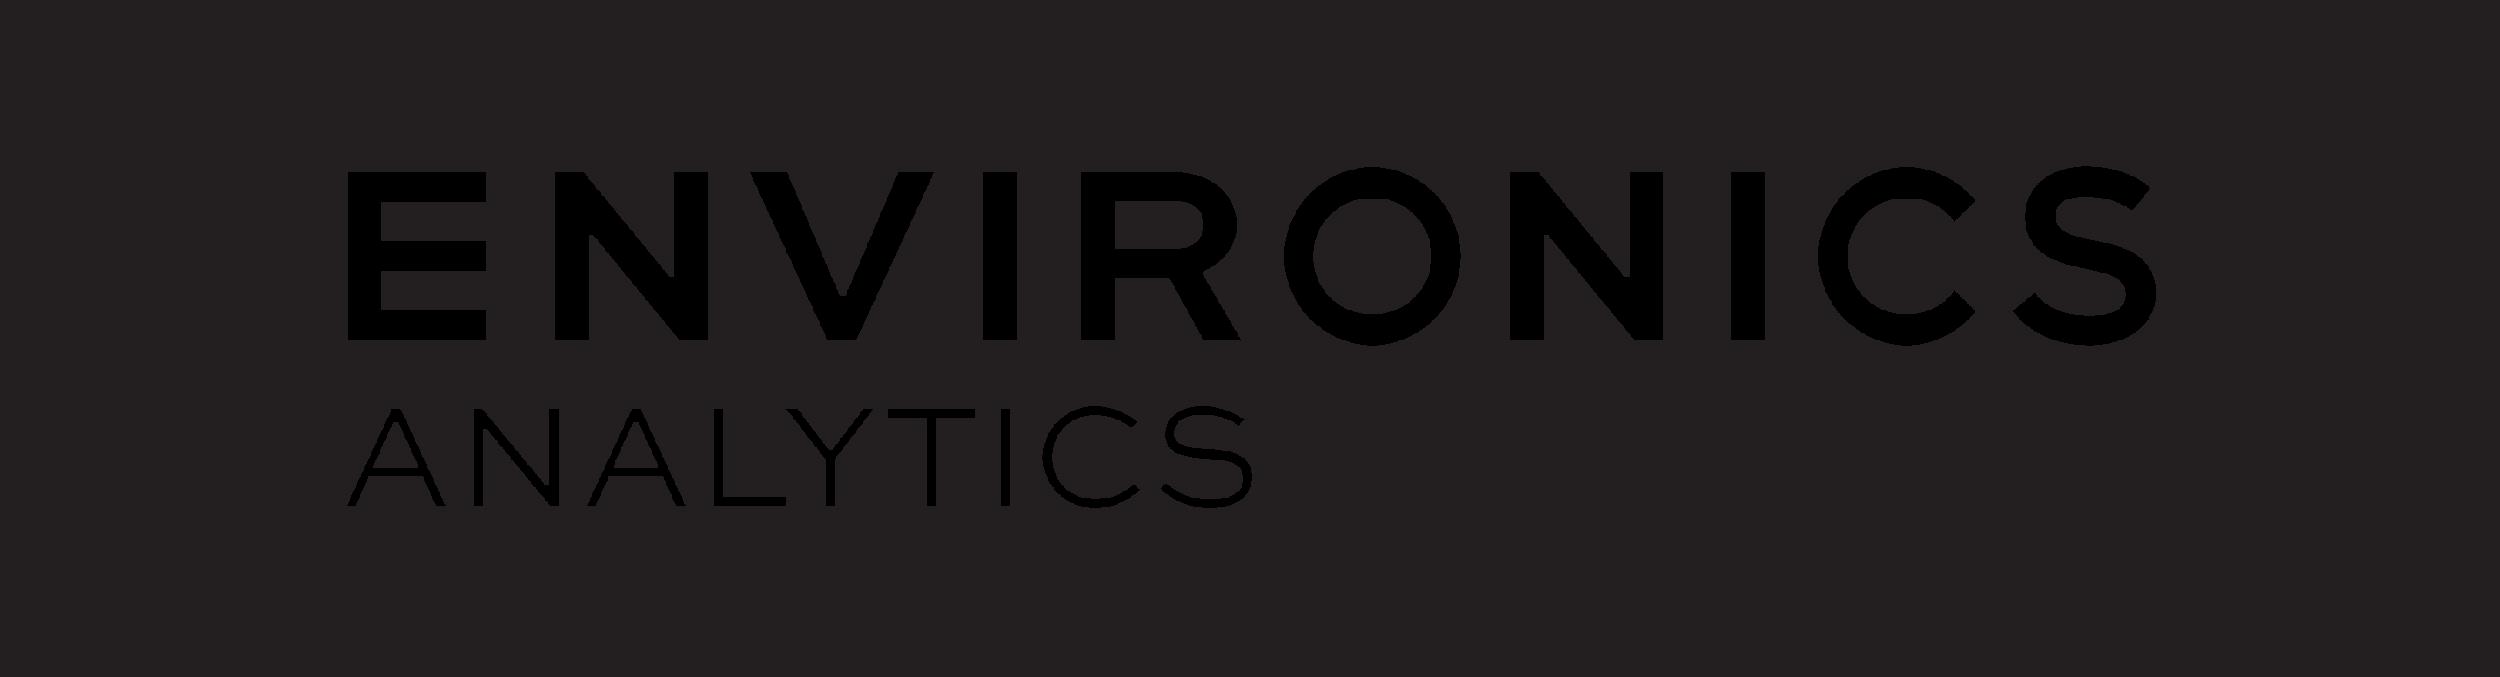 environics-analytics-logo-black2.png